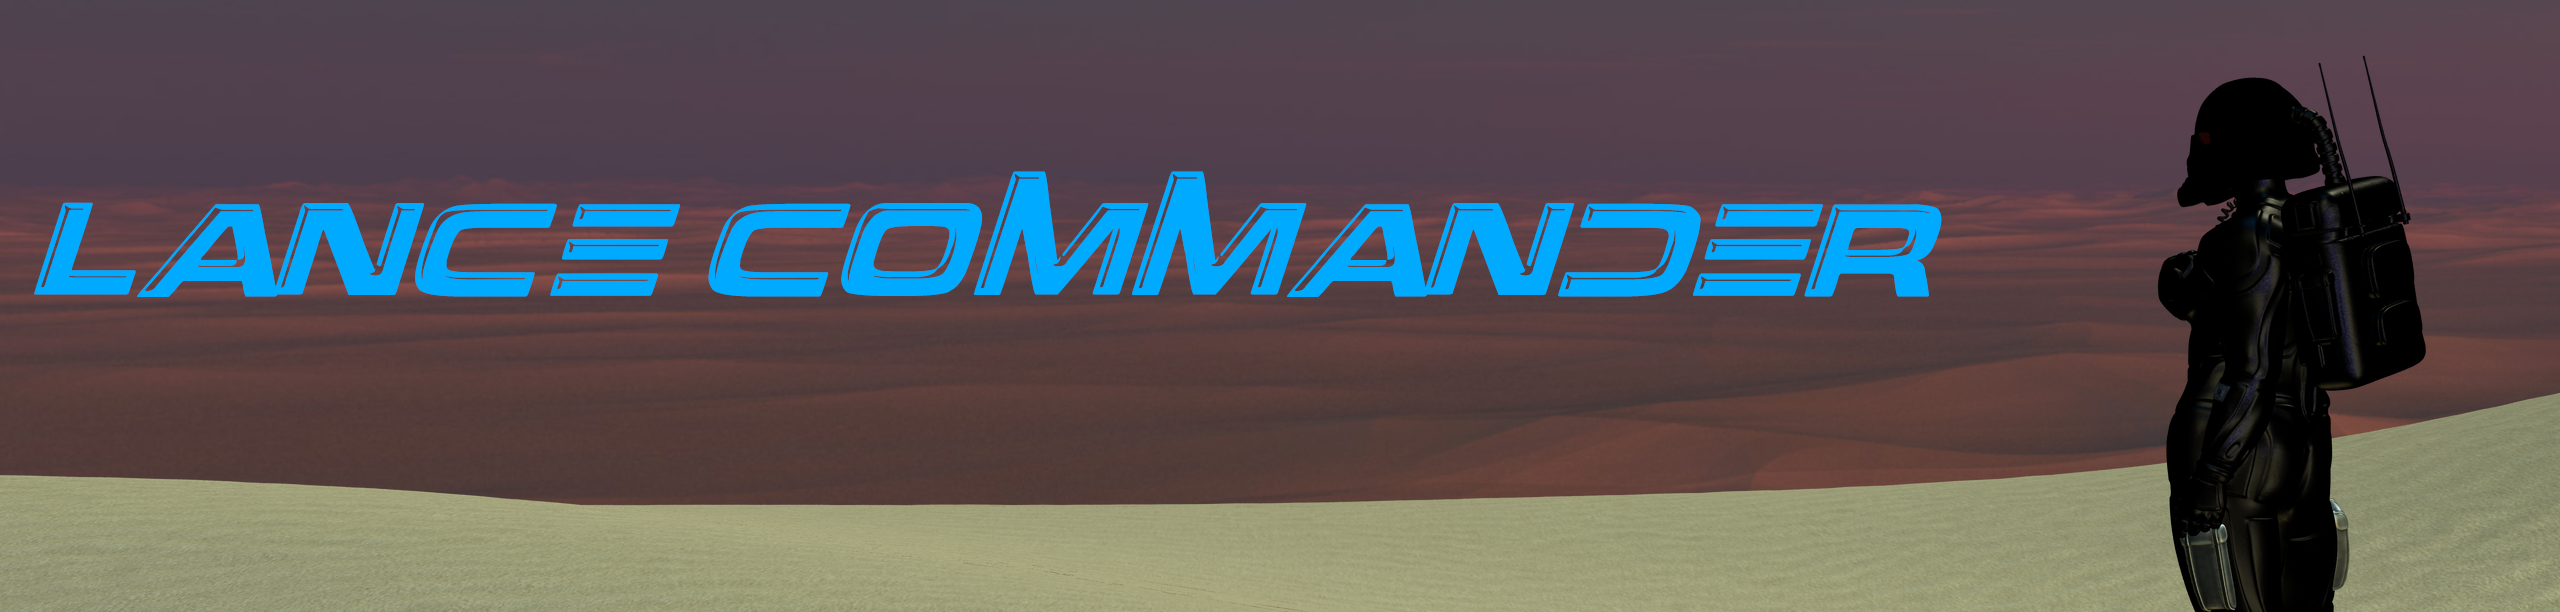 Lance Commander